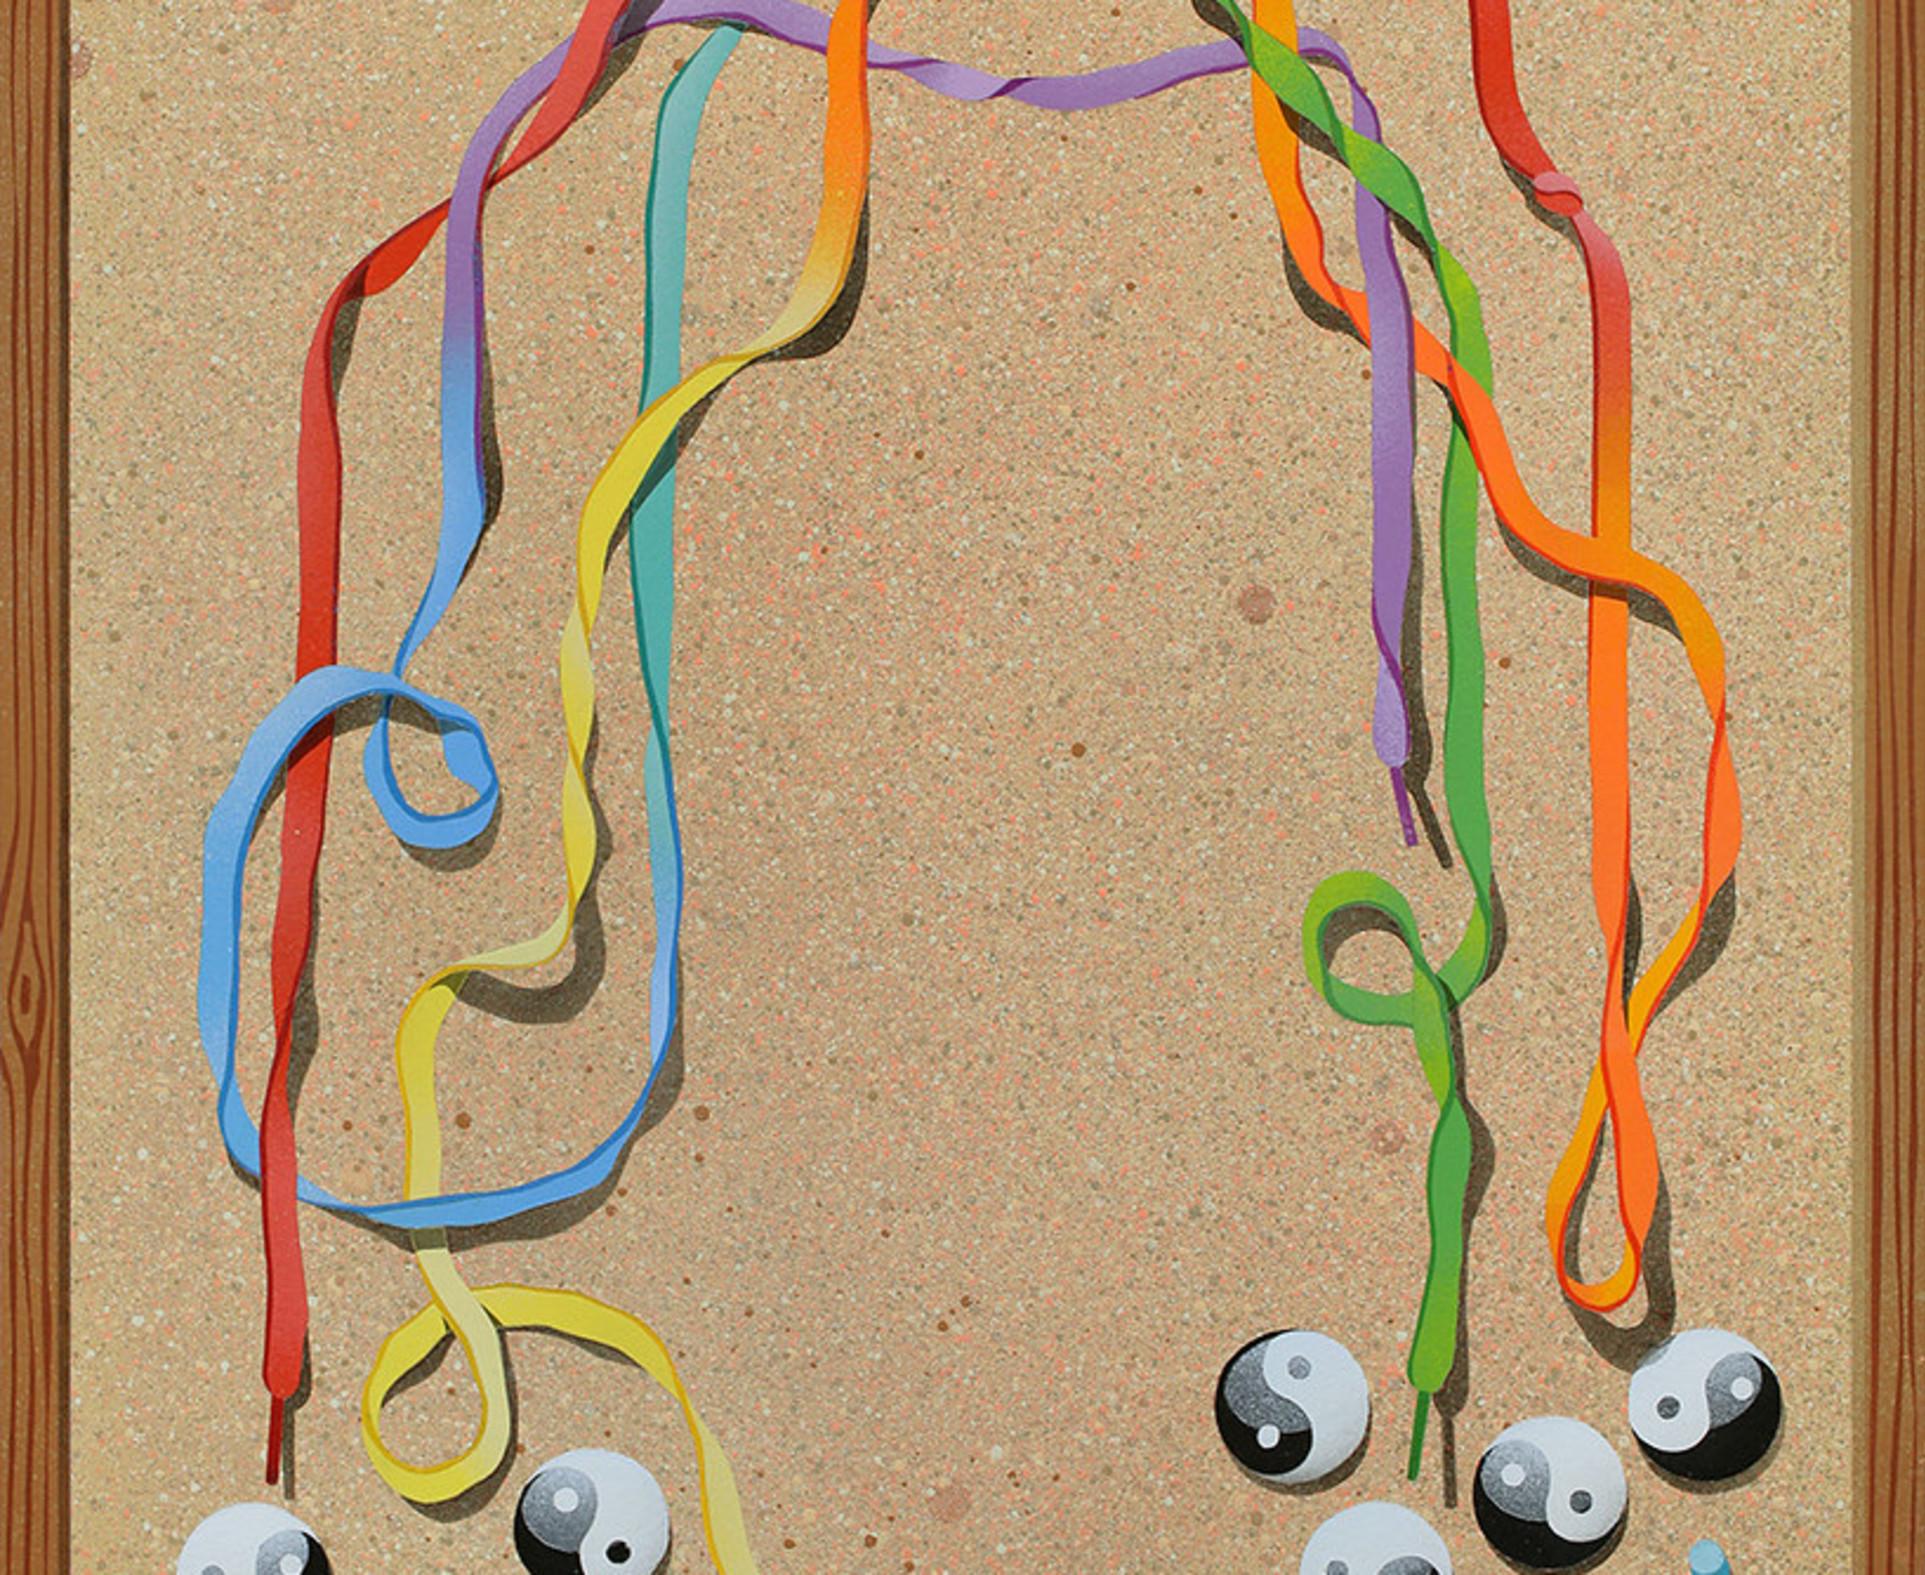 Casey Gray, Trompe l'oeil with Rainbow, 2016